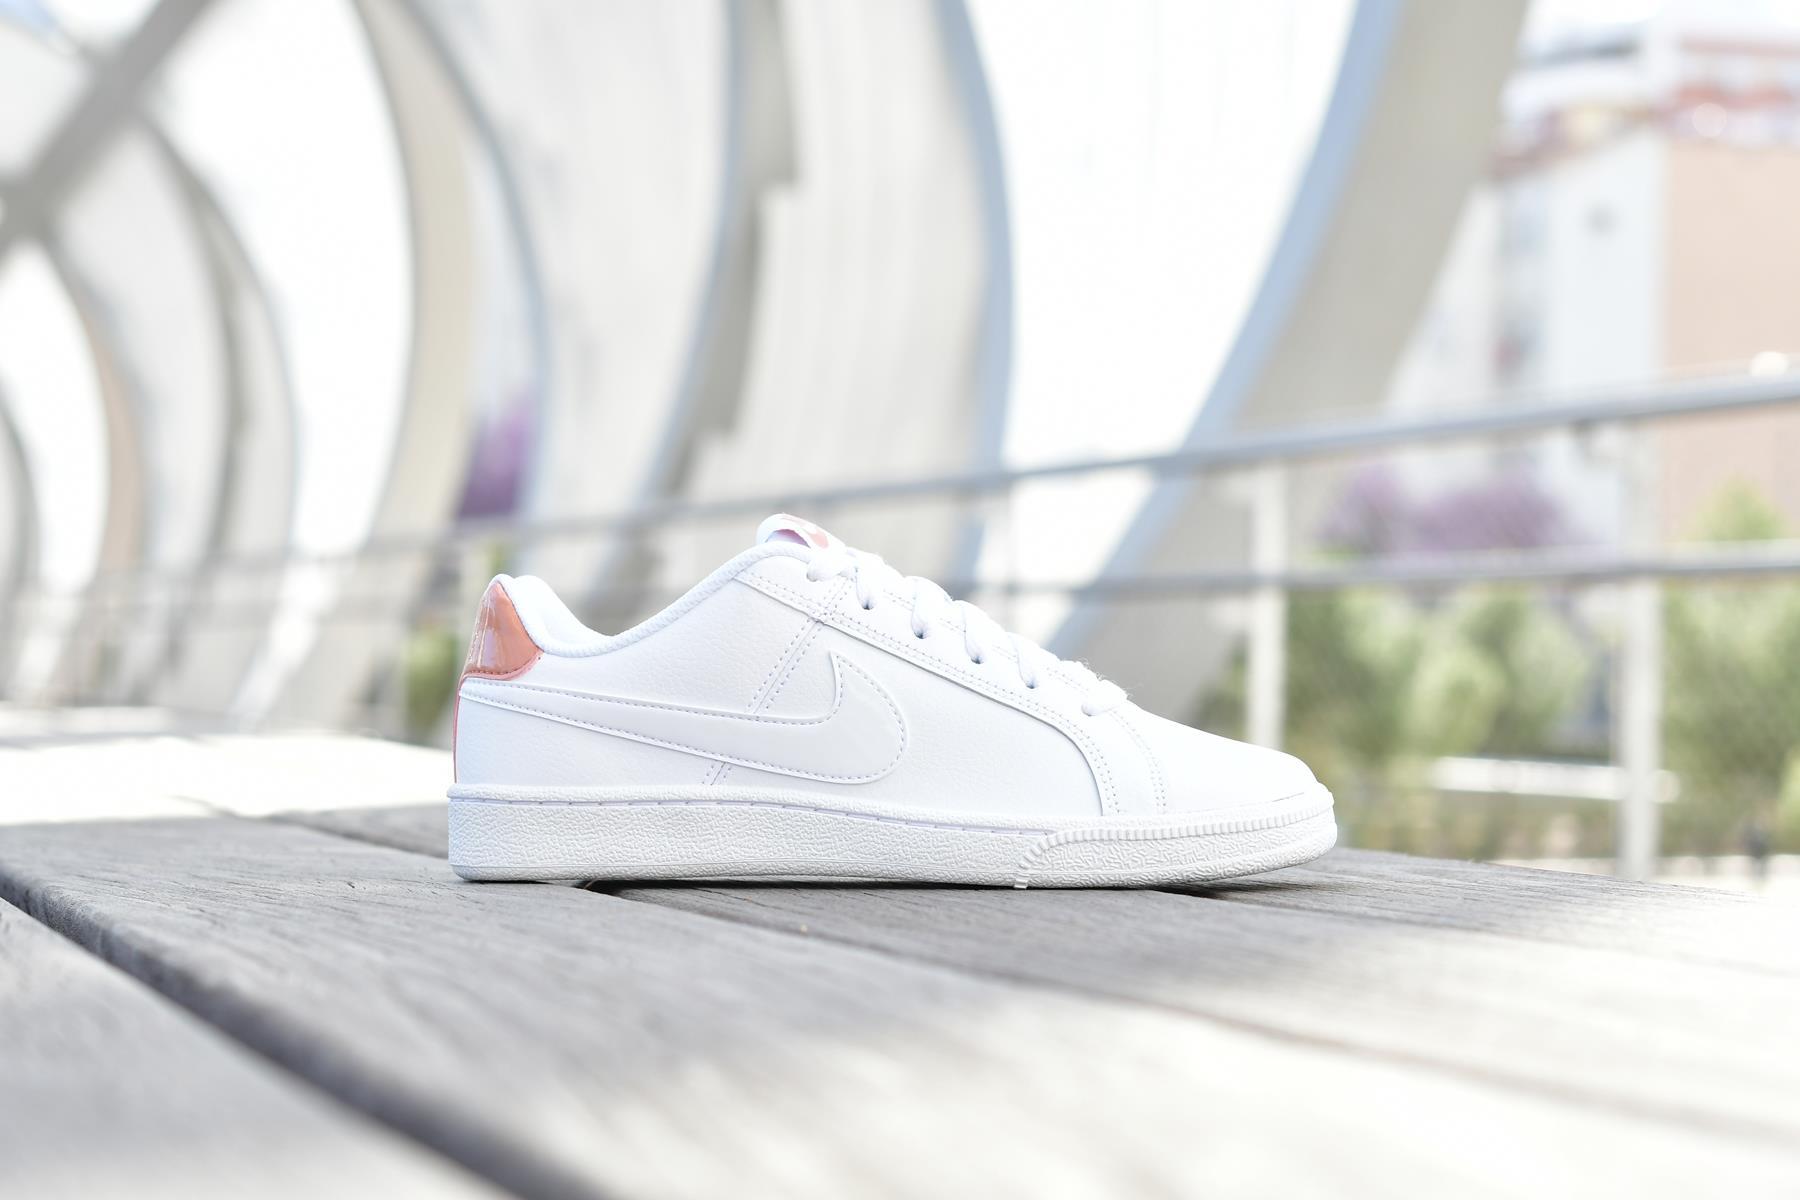 749867-116_amorshoes-nike-sportwear-Court-Royale-White-Rose-Gold-zapatilla-piel-blanca-logo-oro-rosado-rosa-metalizado-749867-116